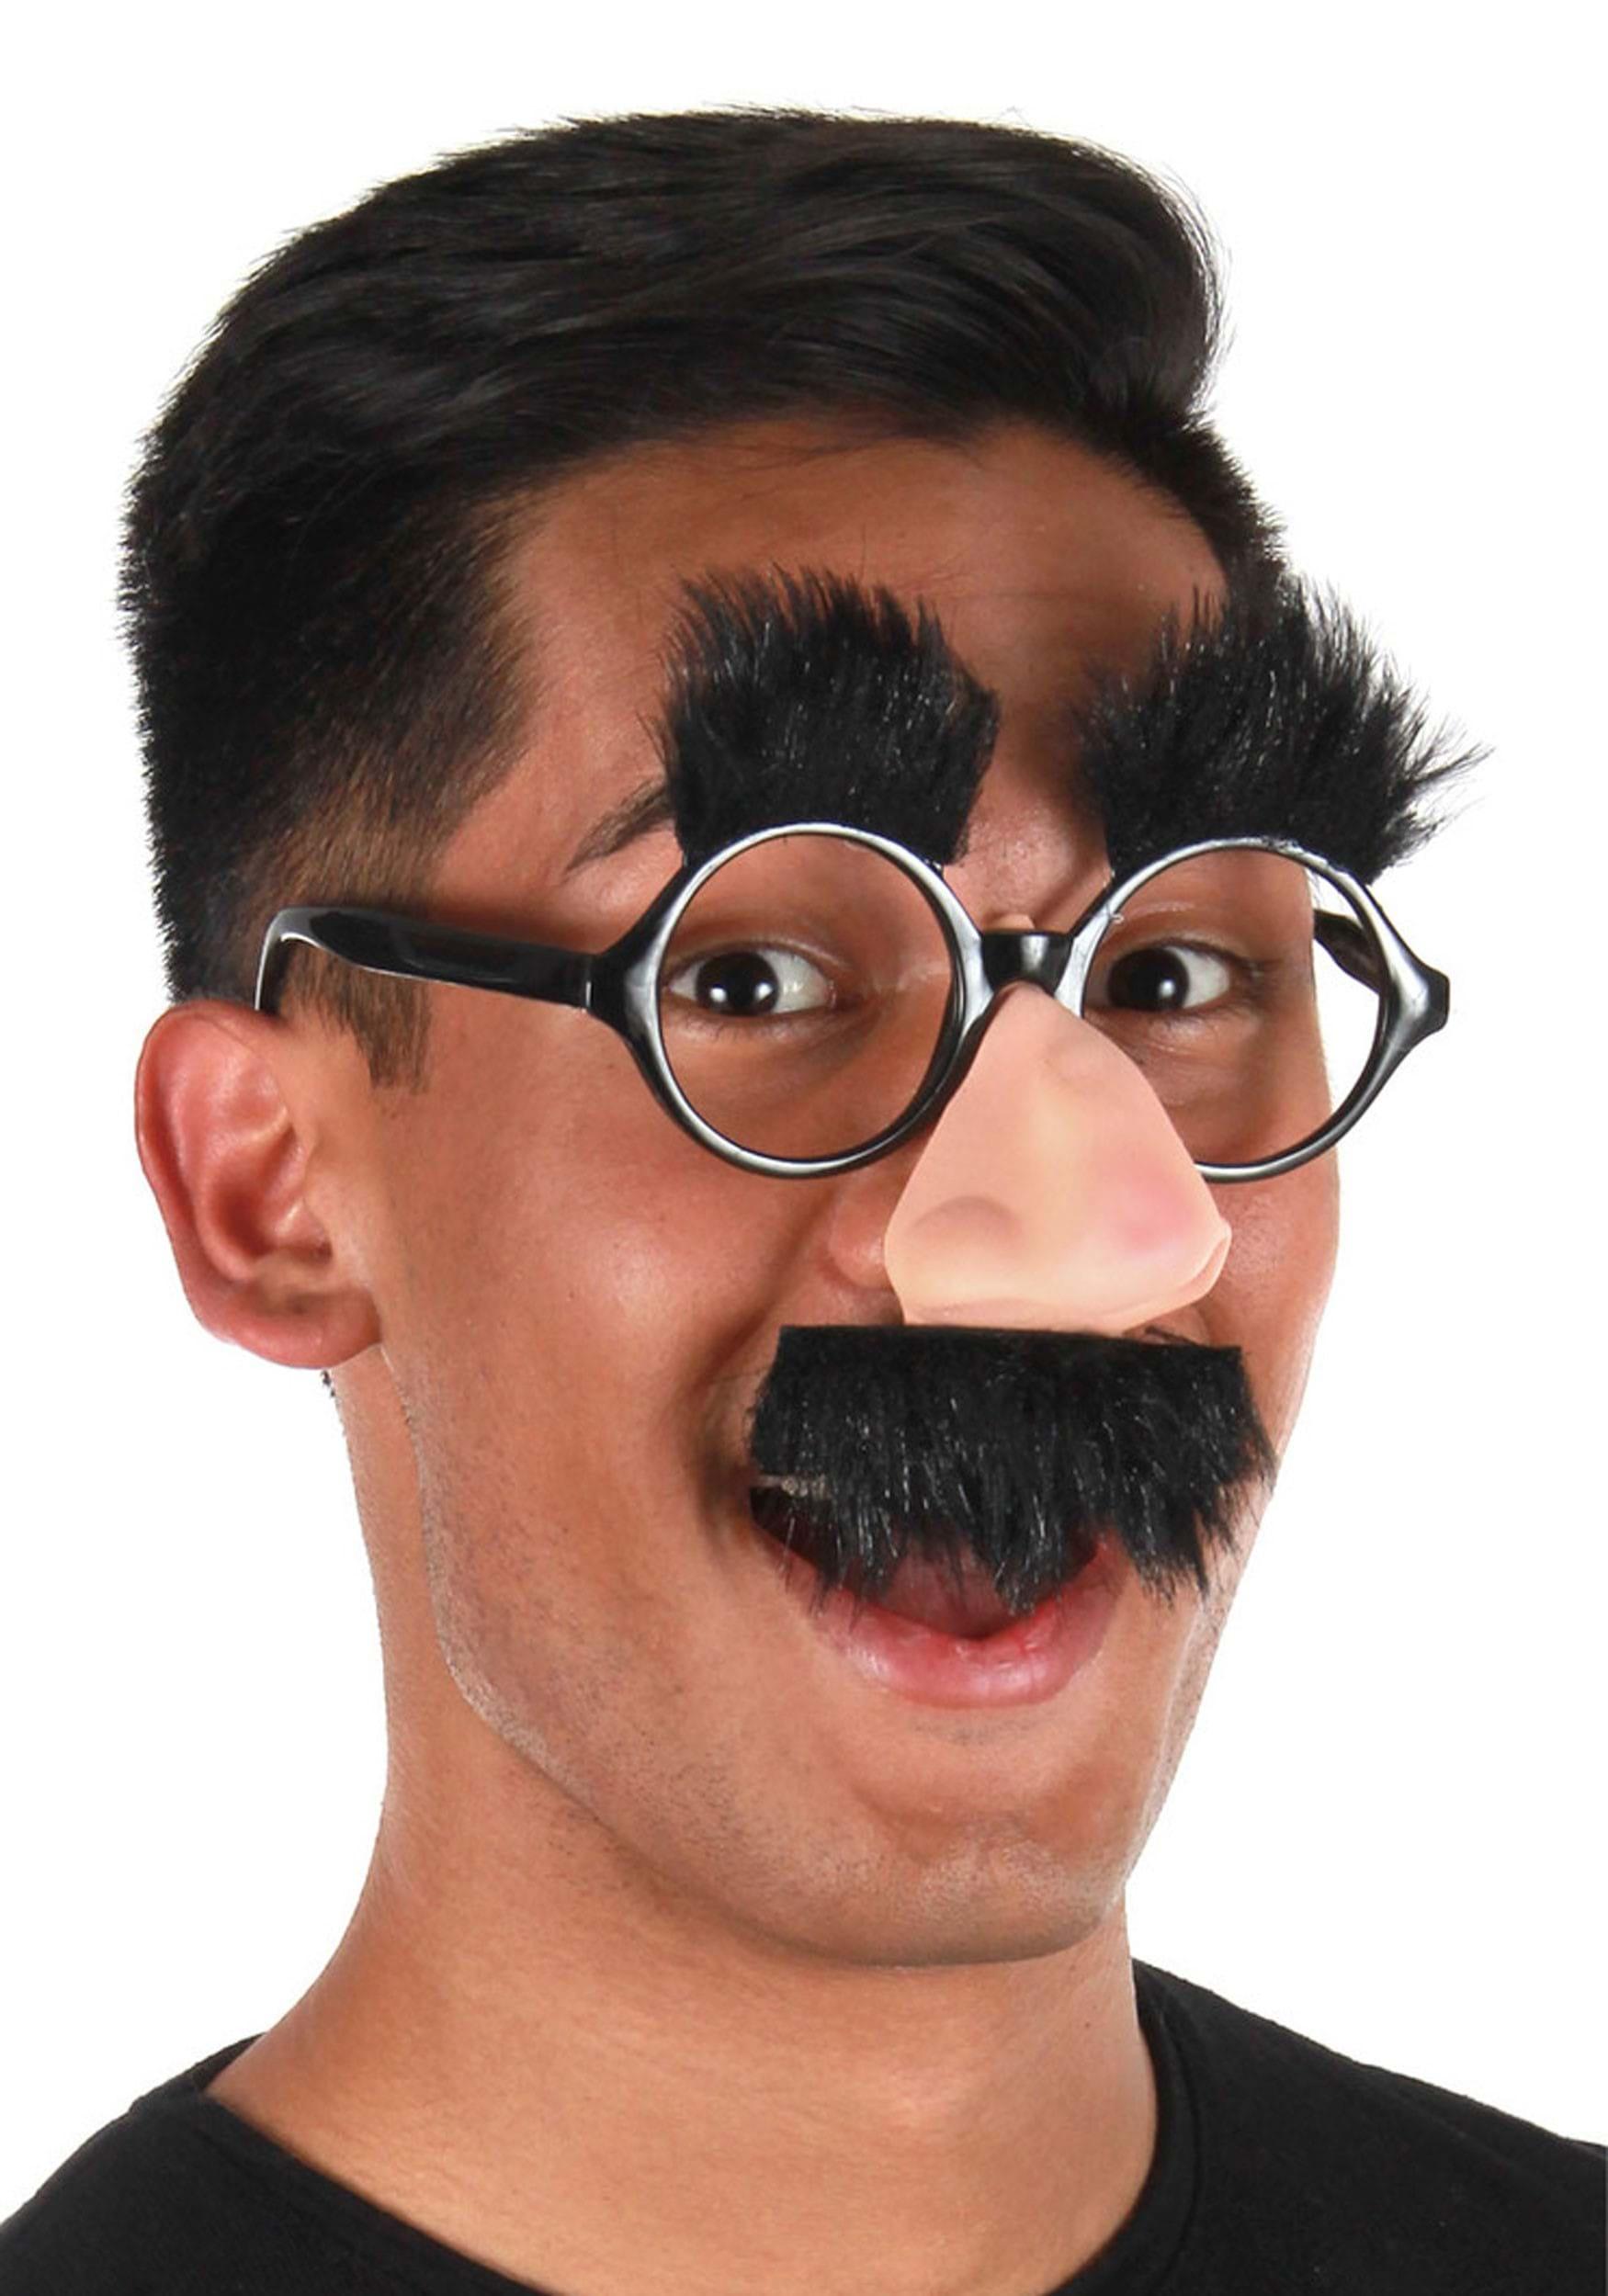 Фото в маске с усами